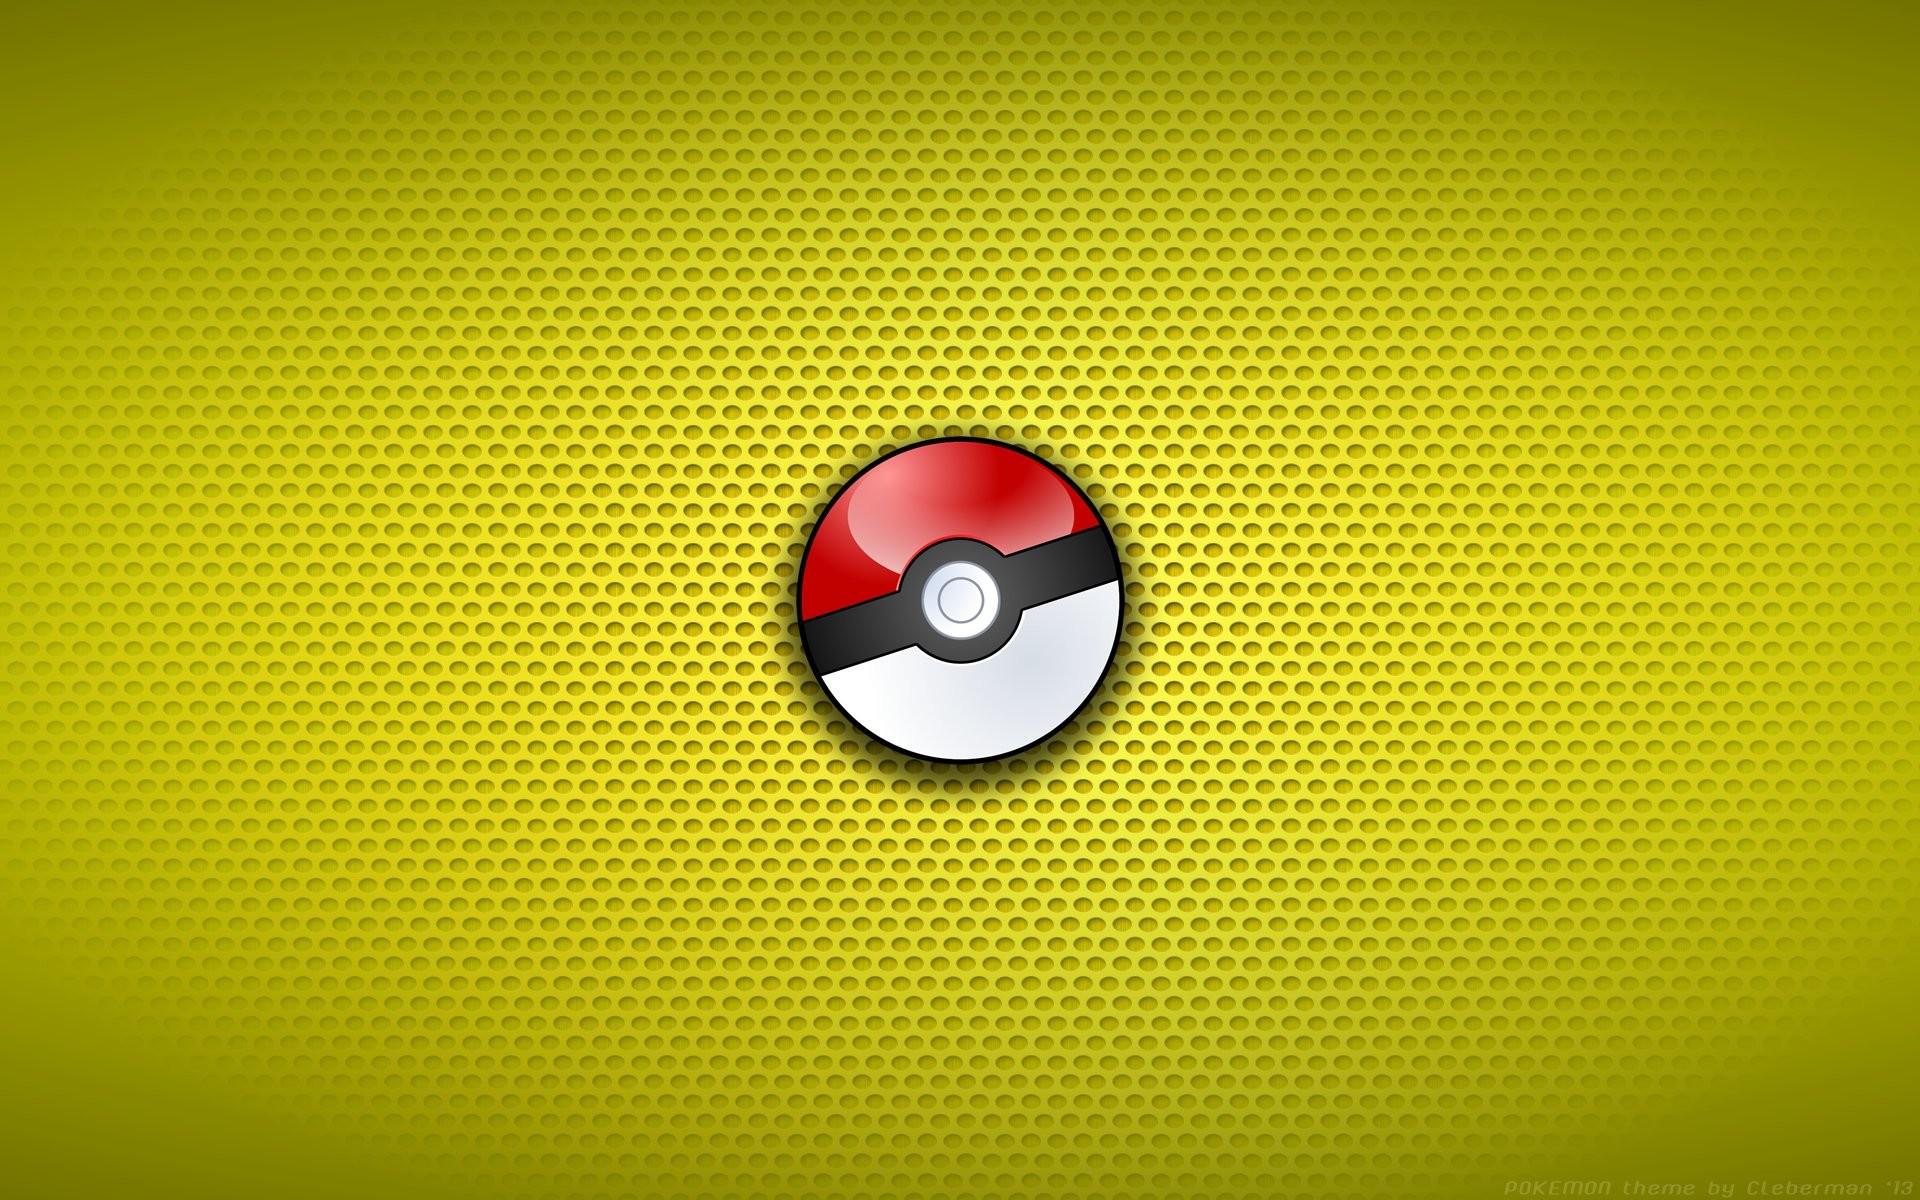 Res: 1920x1200, Computerspiele - Pokémon Pokeball Wallpaper